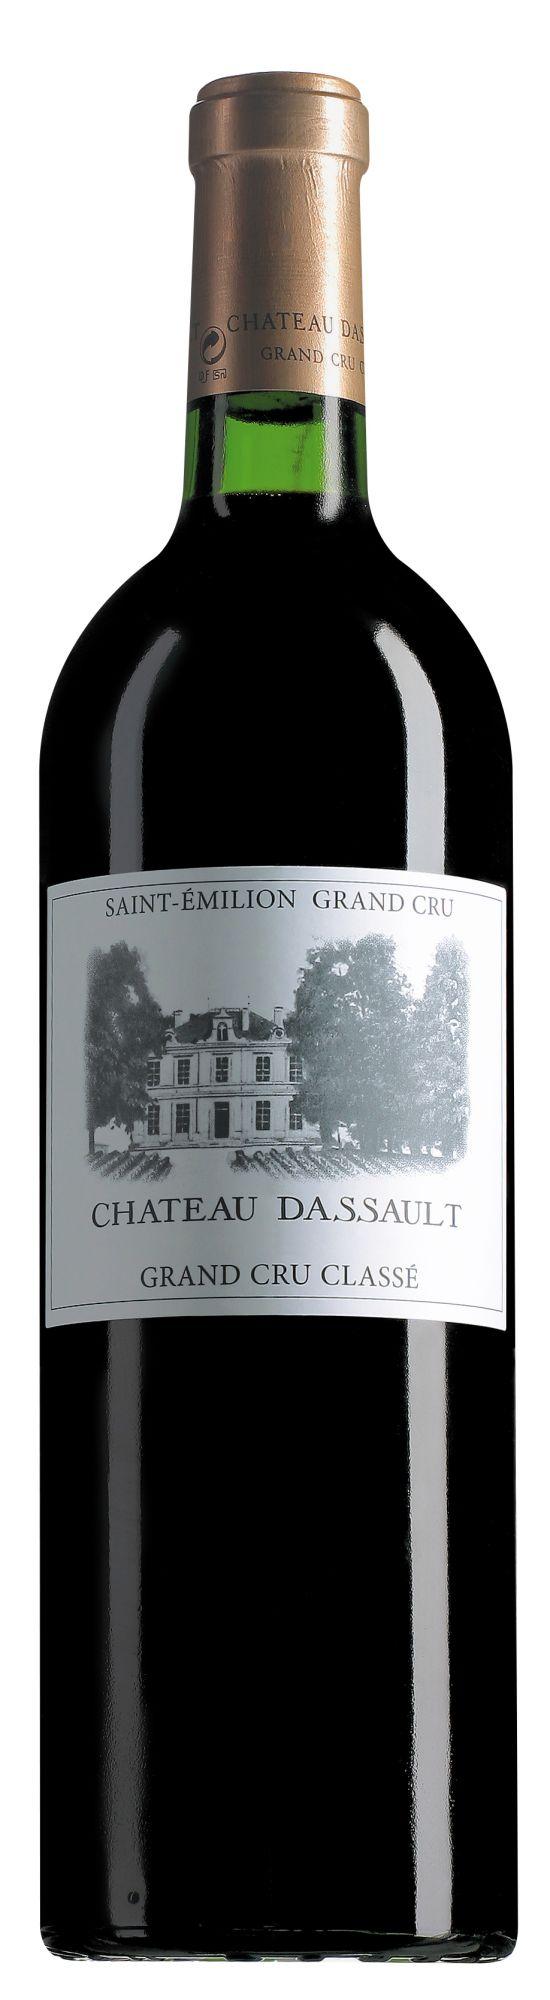 Château Dassault Saint-Émilion Grand Cru Classé